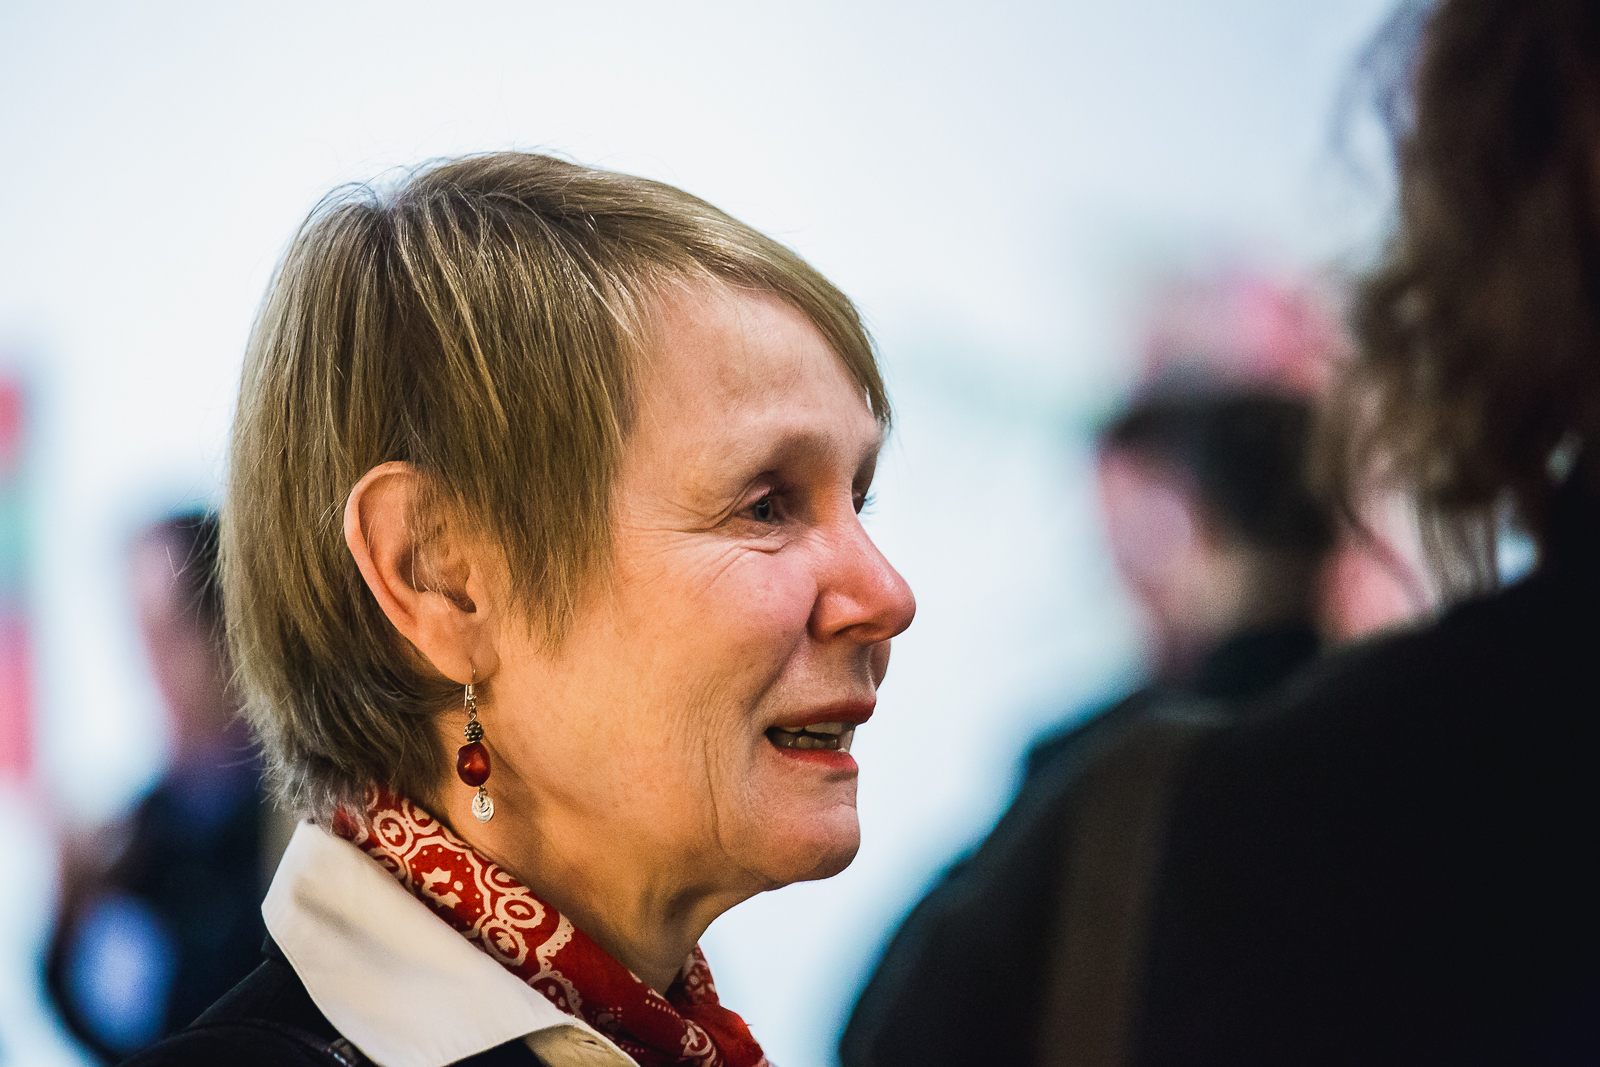 Françoise Derwael (SAB) - IN BANQUE 2018 - Crédit photo : Guillermo Gomez